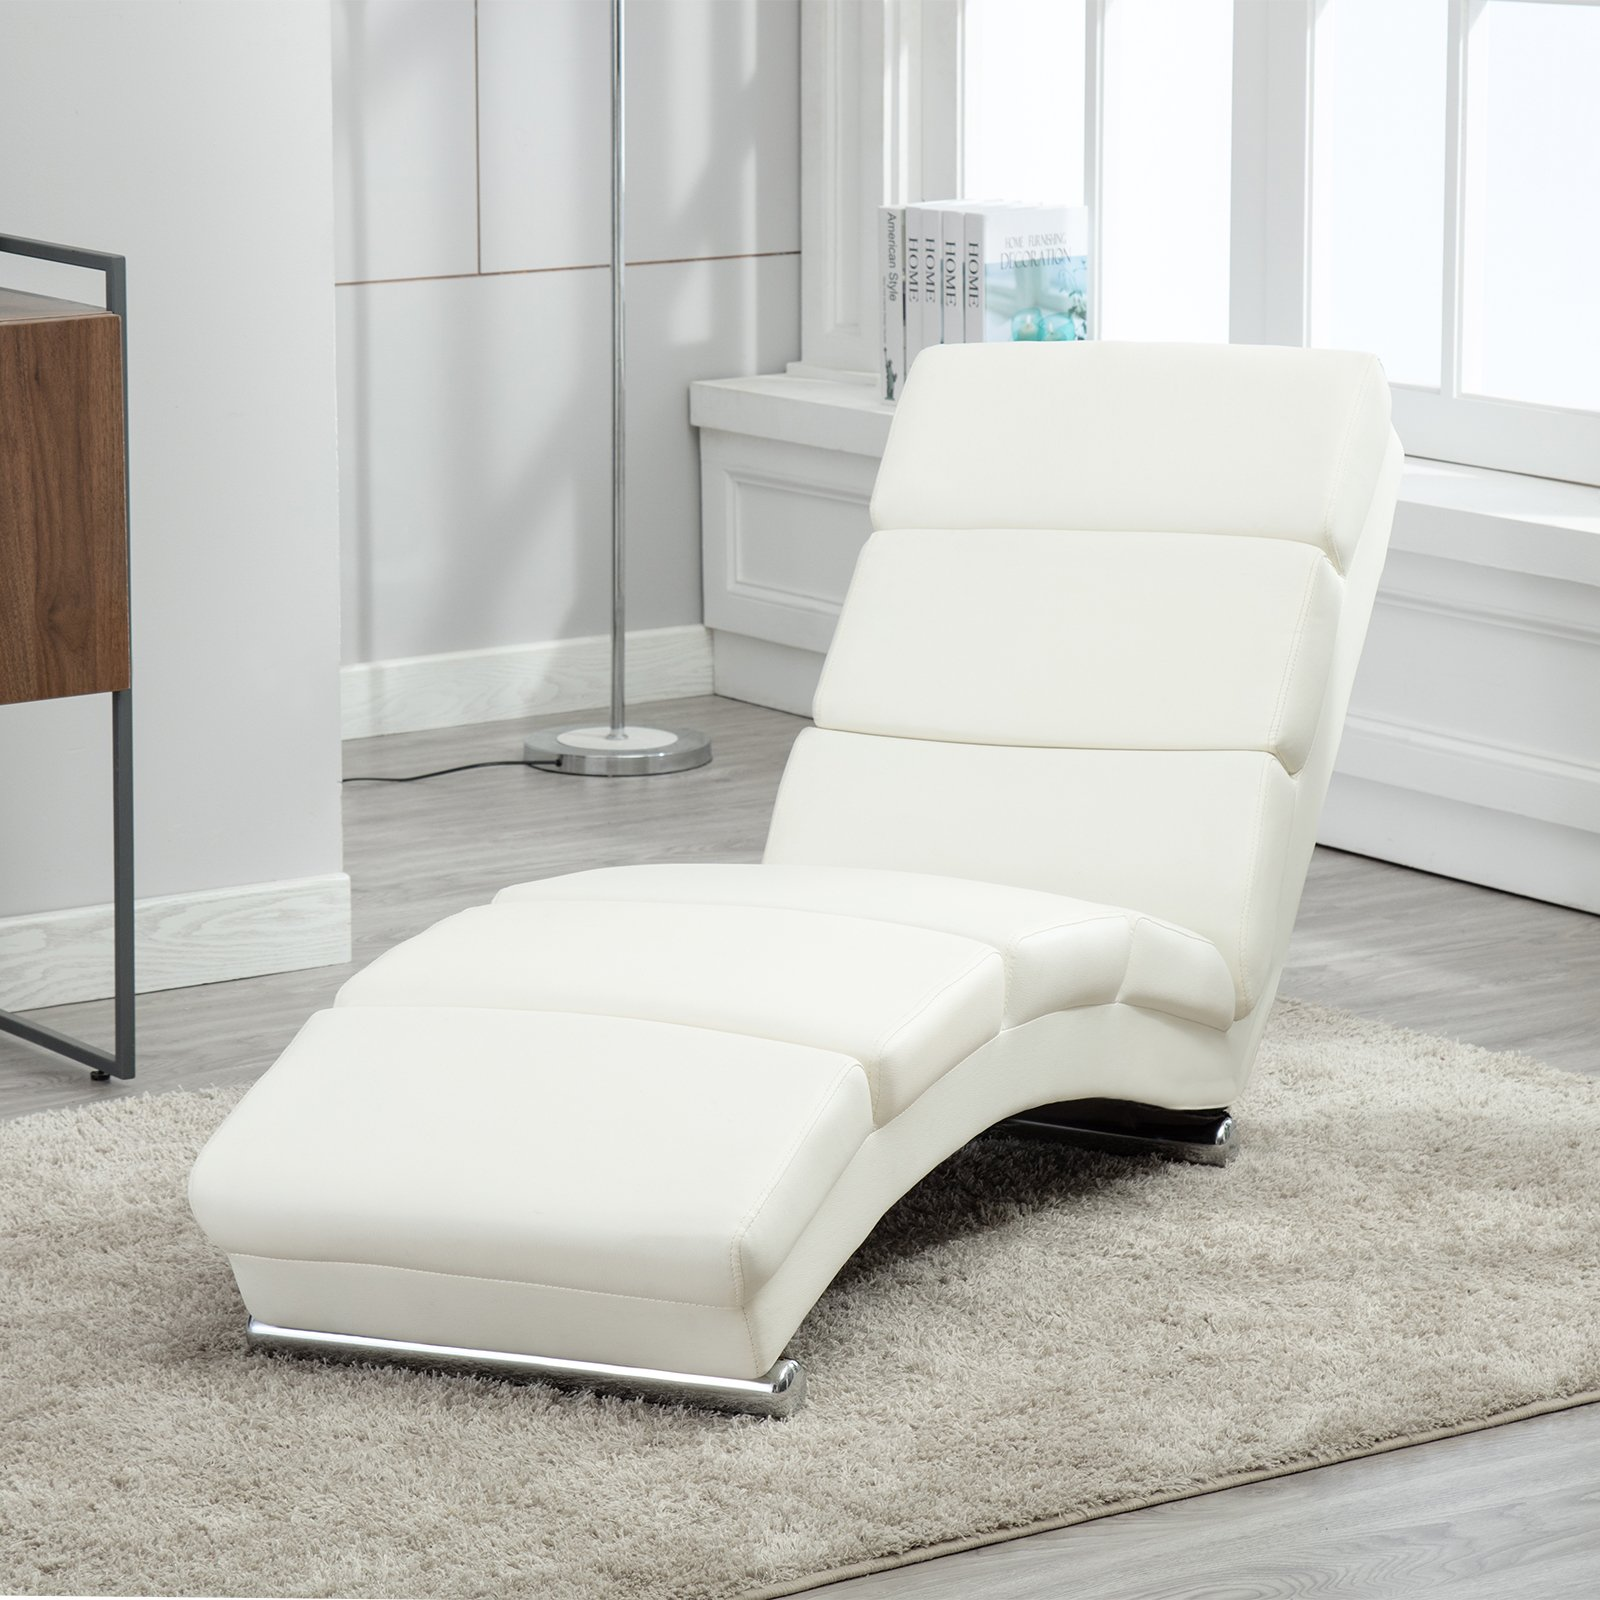 Small Chaise Sofa: Amazon.co.uk